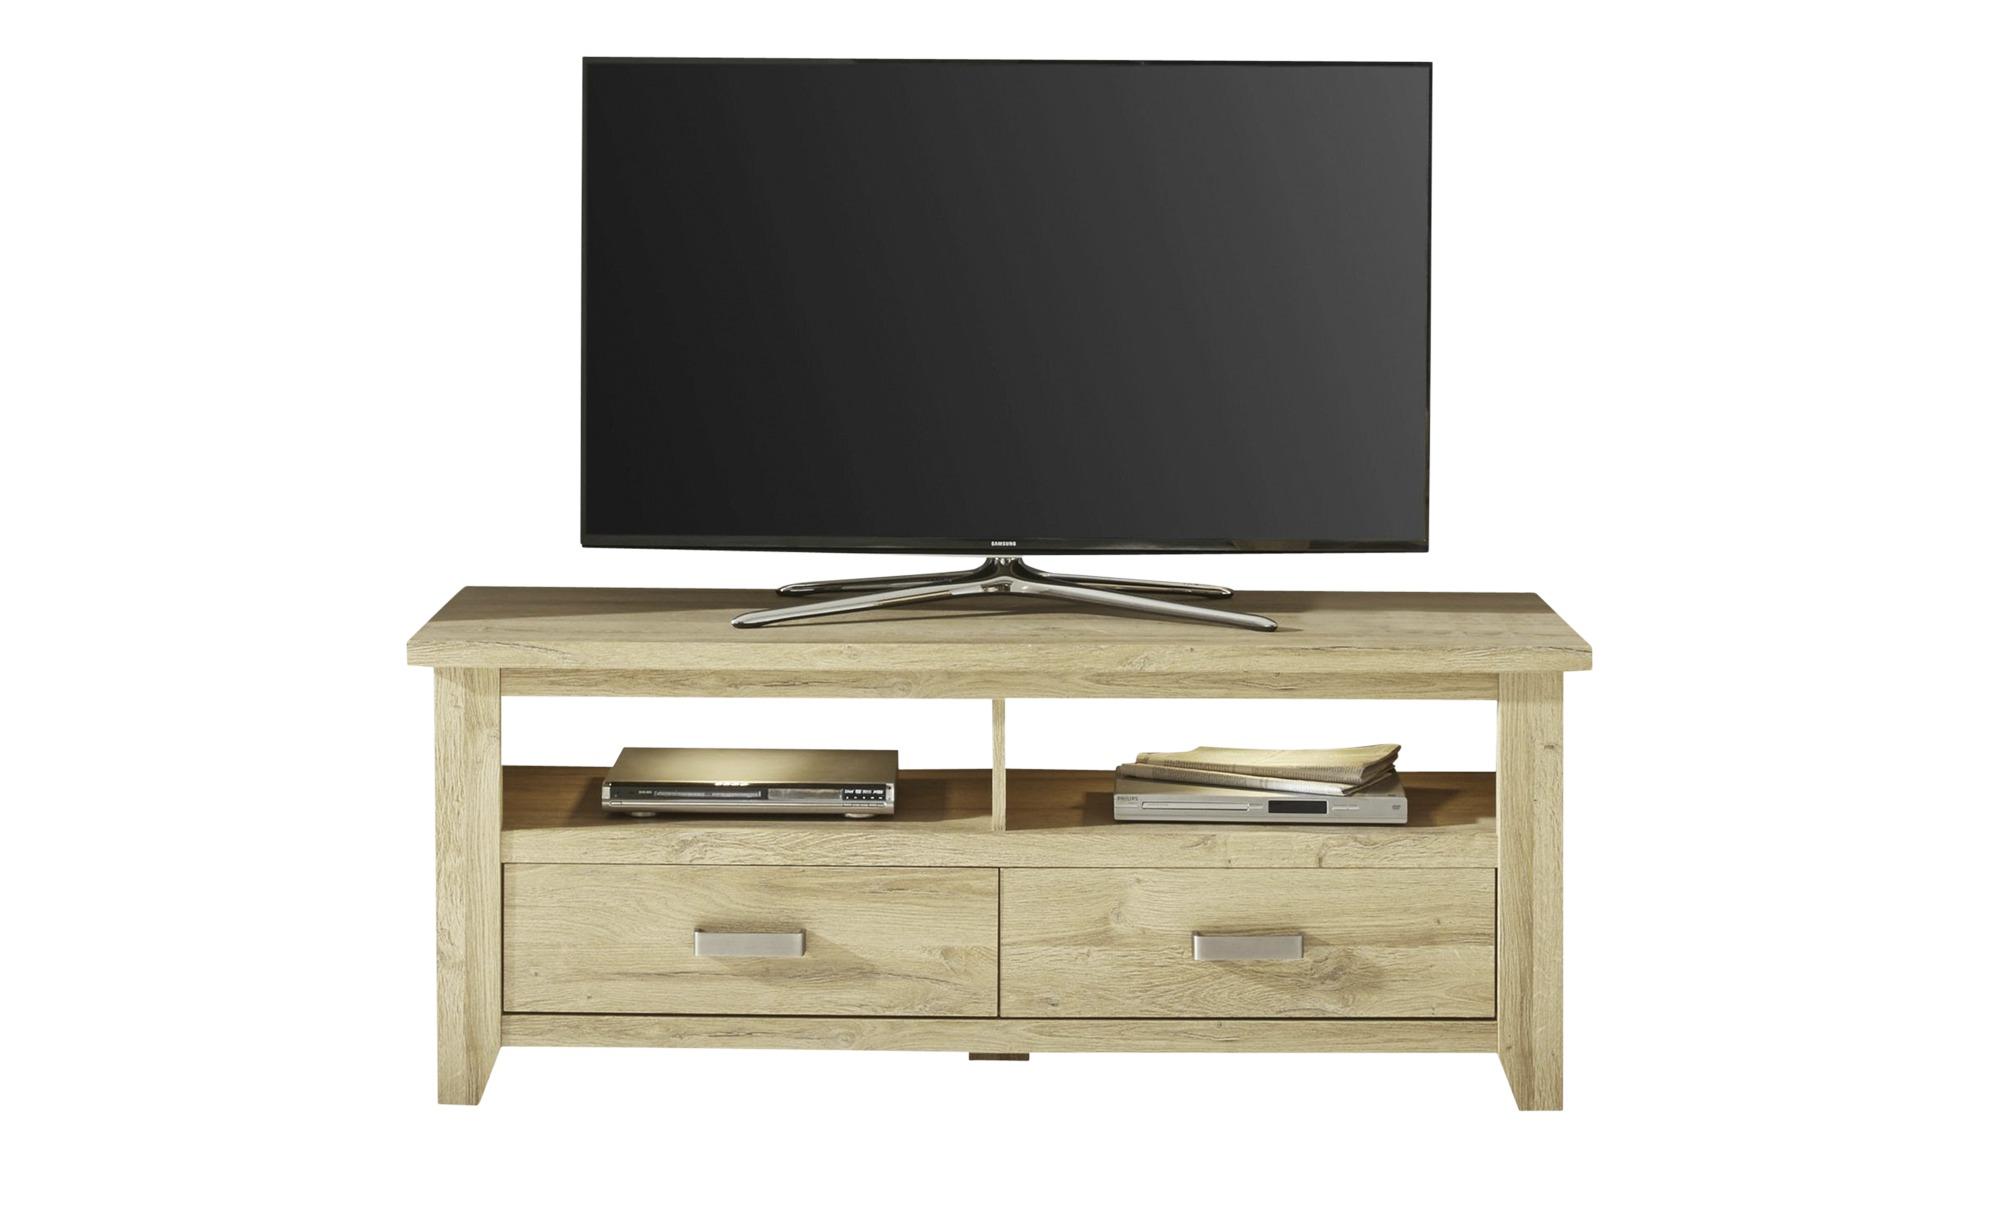 TV- Lowboard  Cosenza ¦ holzfarben ¦ Maße (cm): B: 143 H: 58 T: 48 TV- & Media Möbel > TV-Racks - Höffner | Wohnzimmer > TV-HiFi-Möbel | Möbel Höffner DE